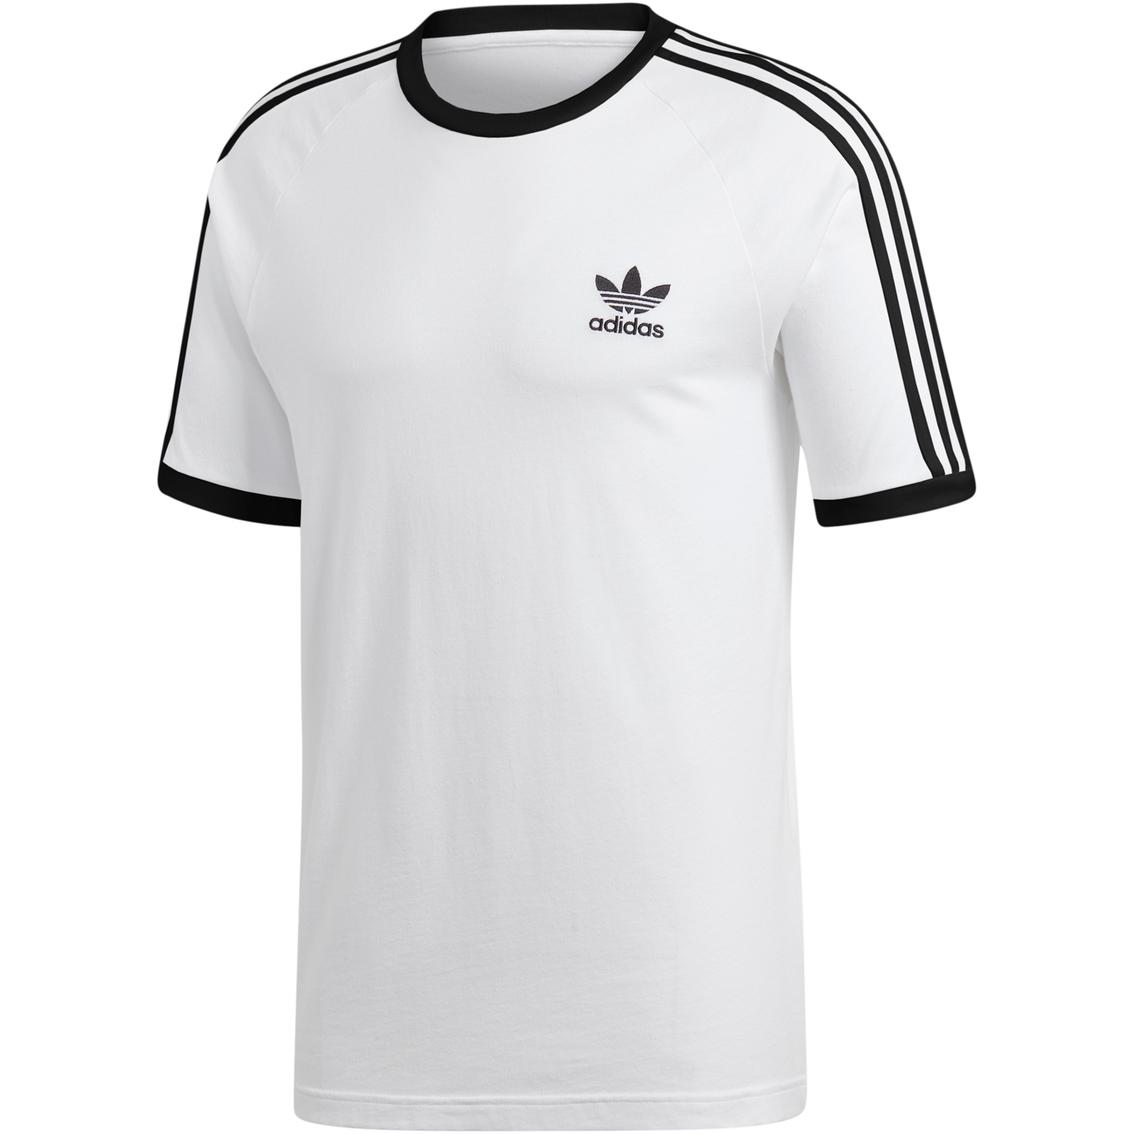 Teseo Desierto retirarse  Adidas 3 Stripe Lifestyle Tee | Shirts | Clothing & Accessories | Shop The  Exchange